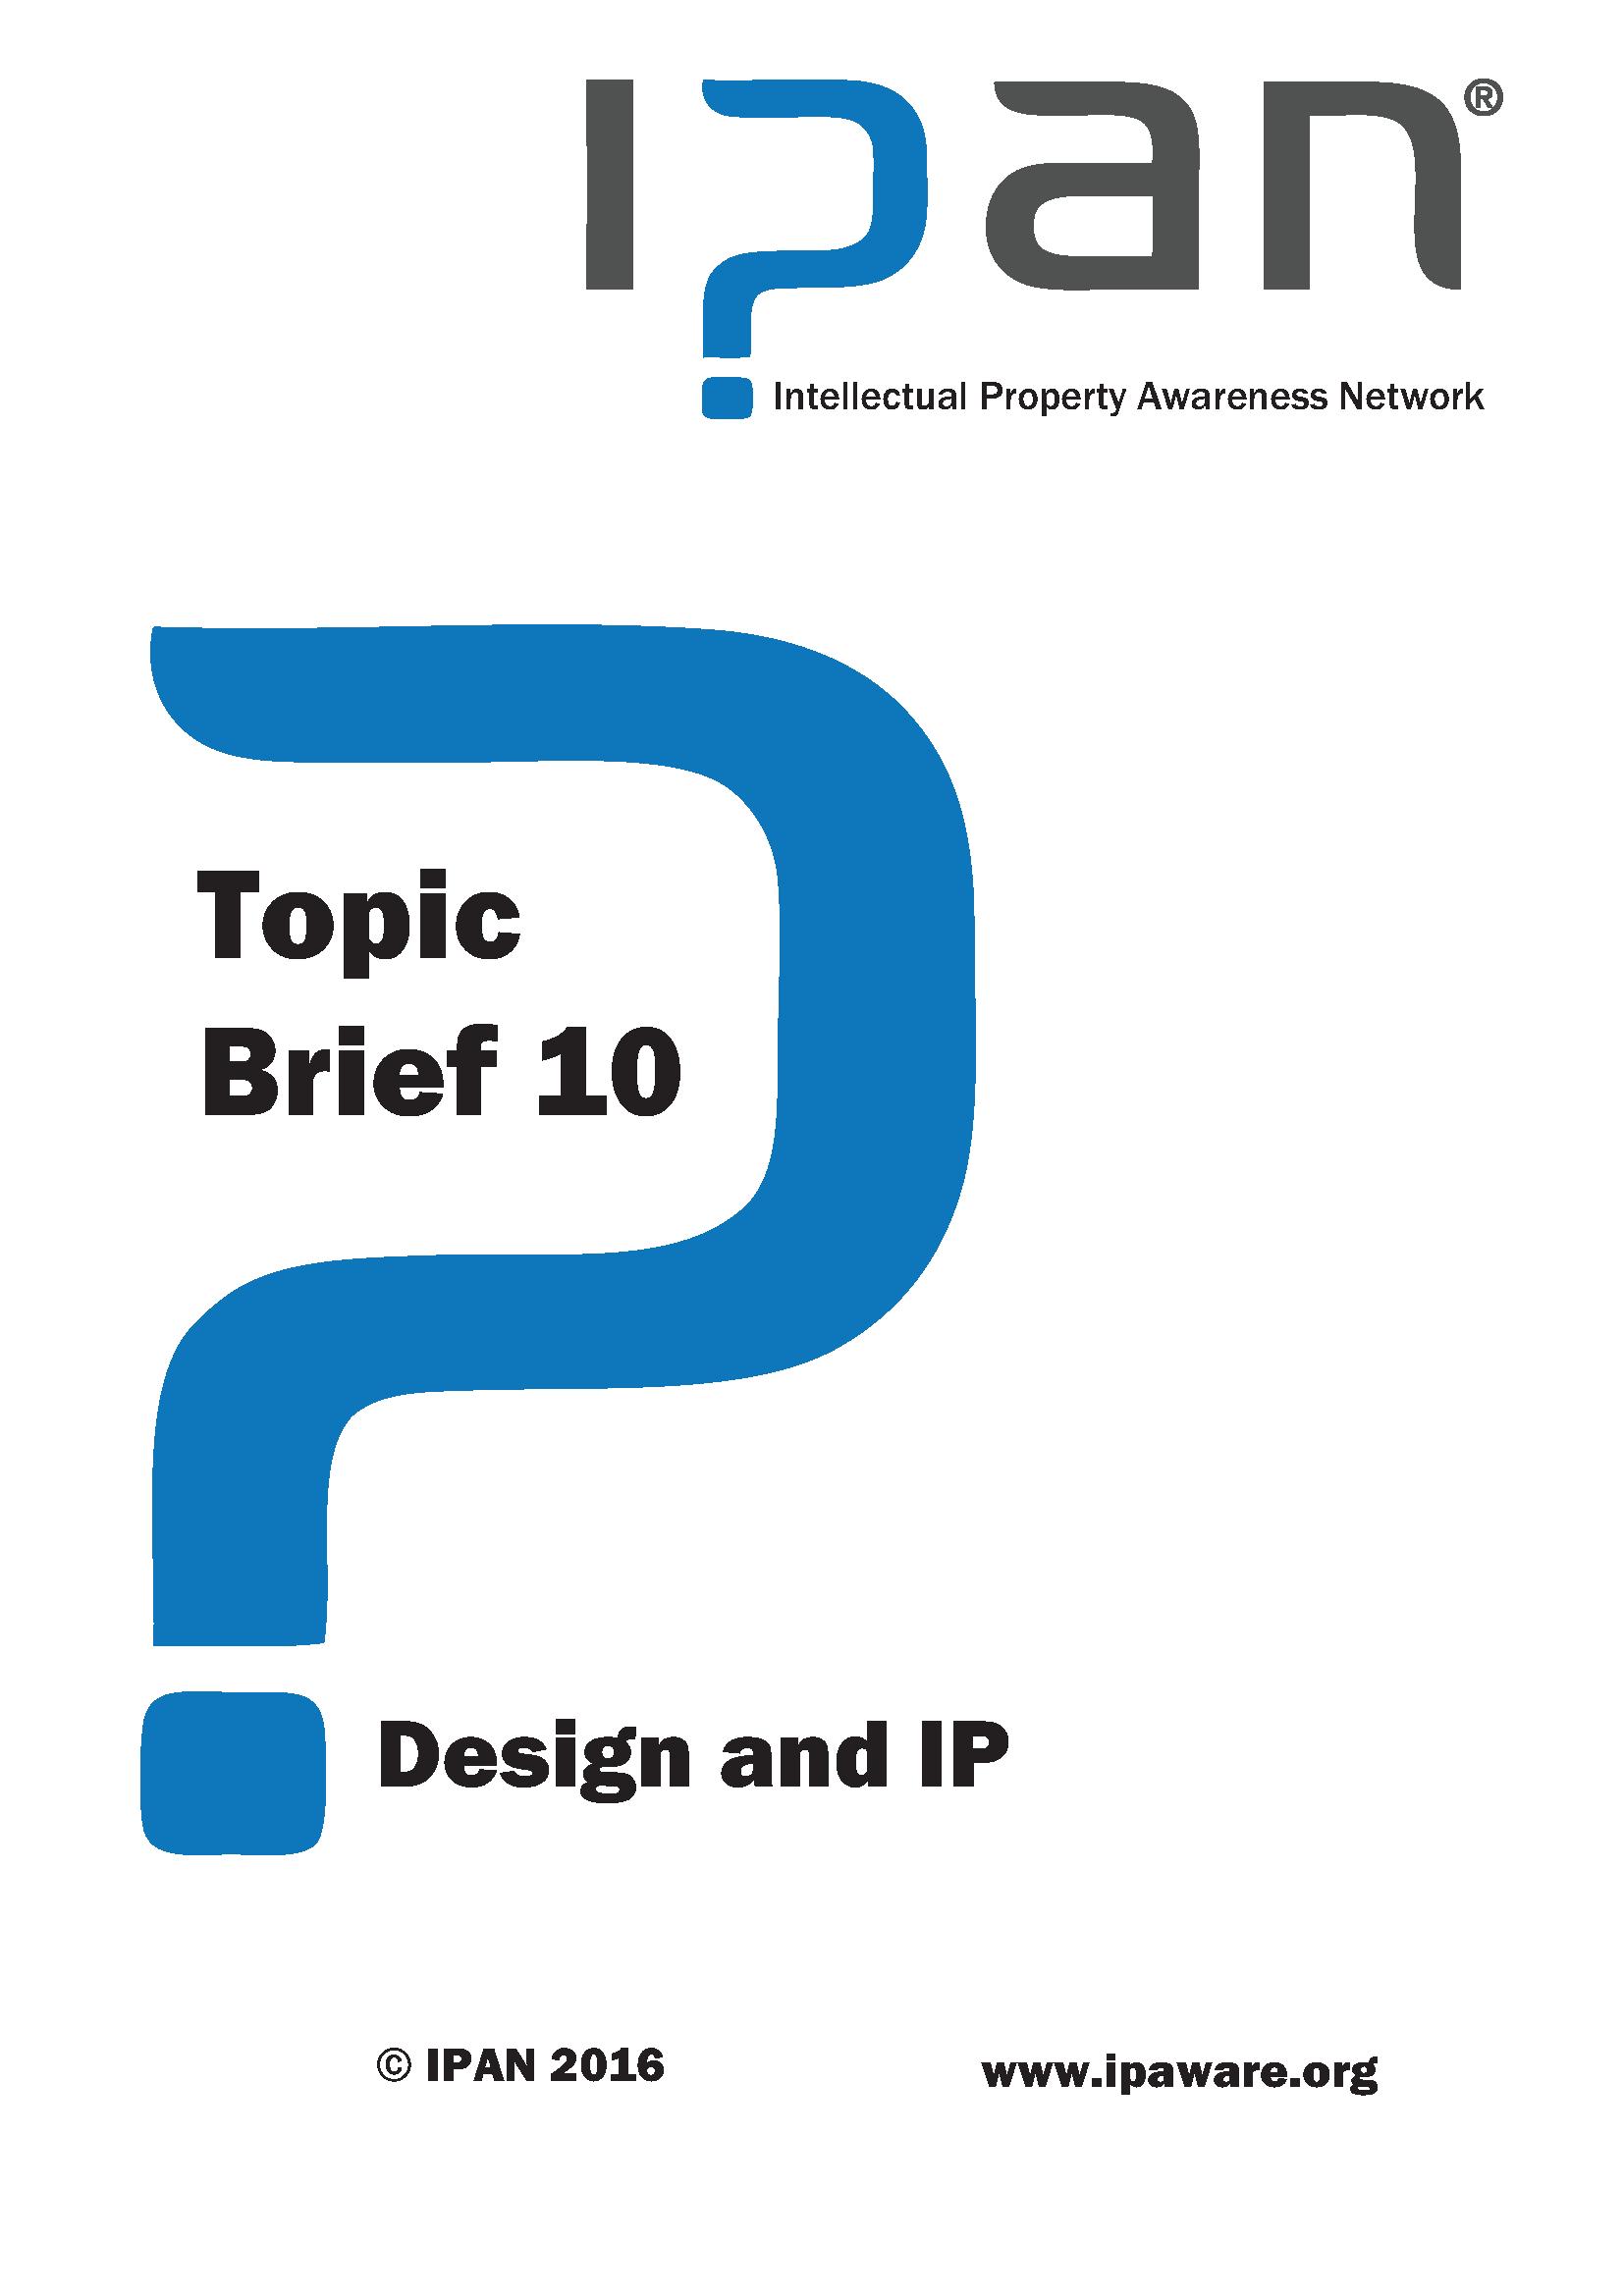 Design and IP